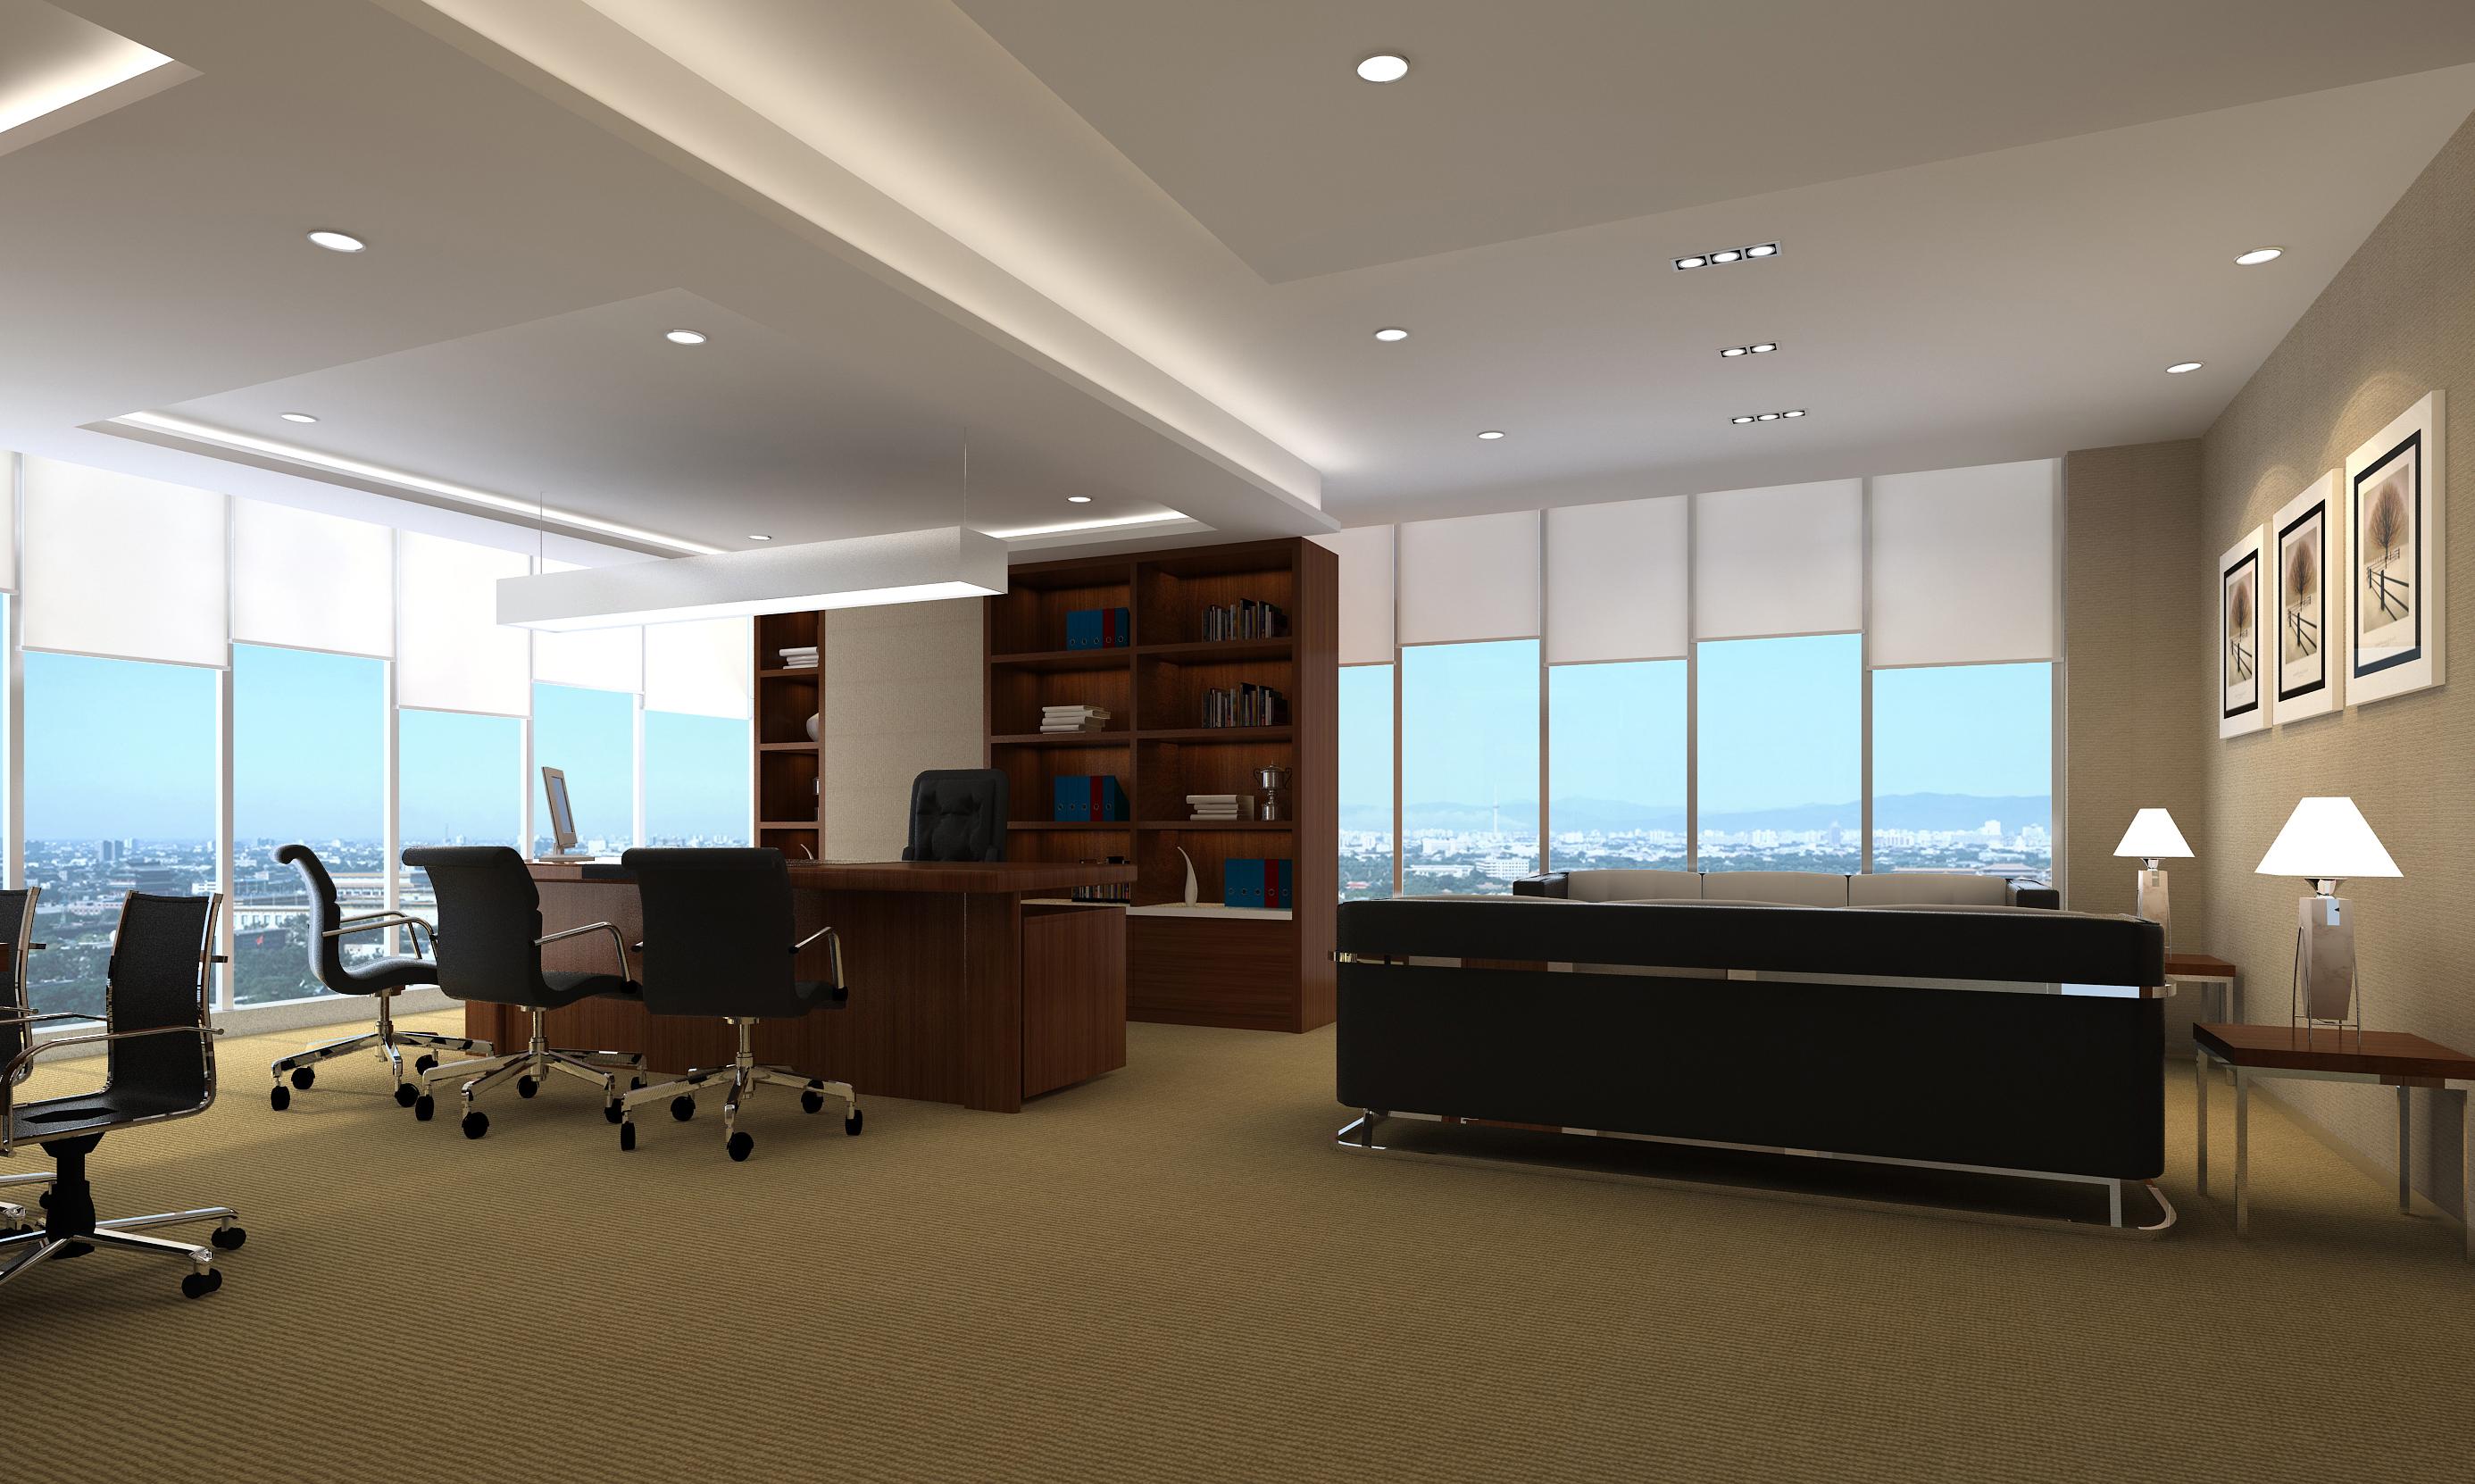 office 043 3d model max 137277